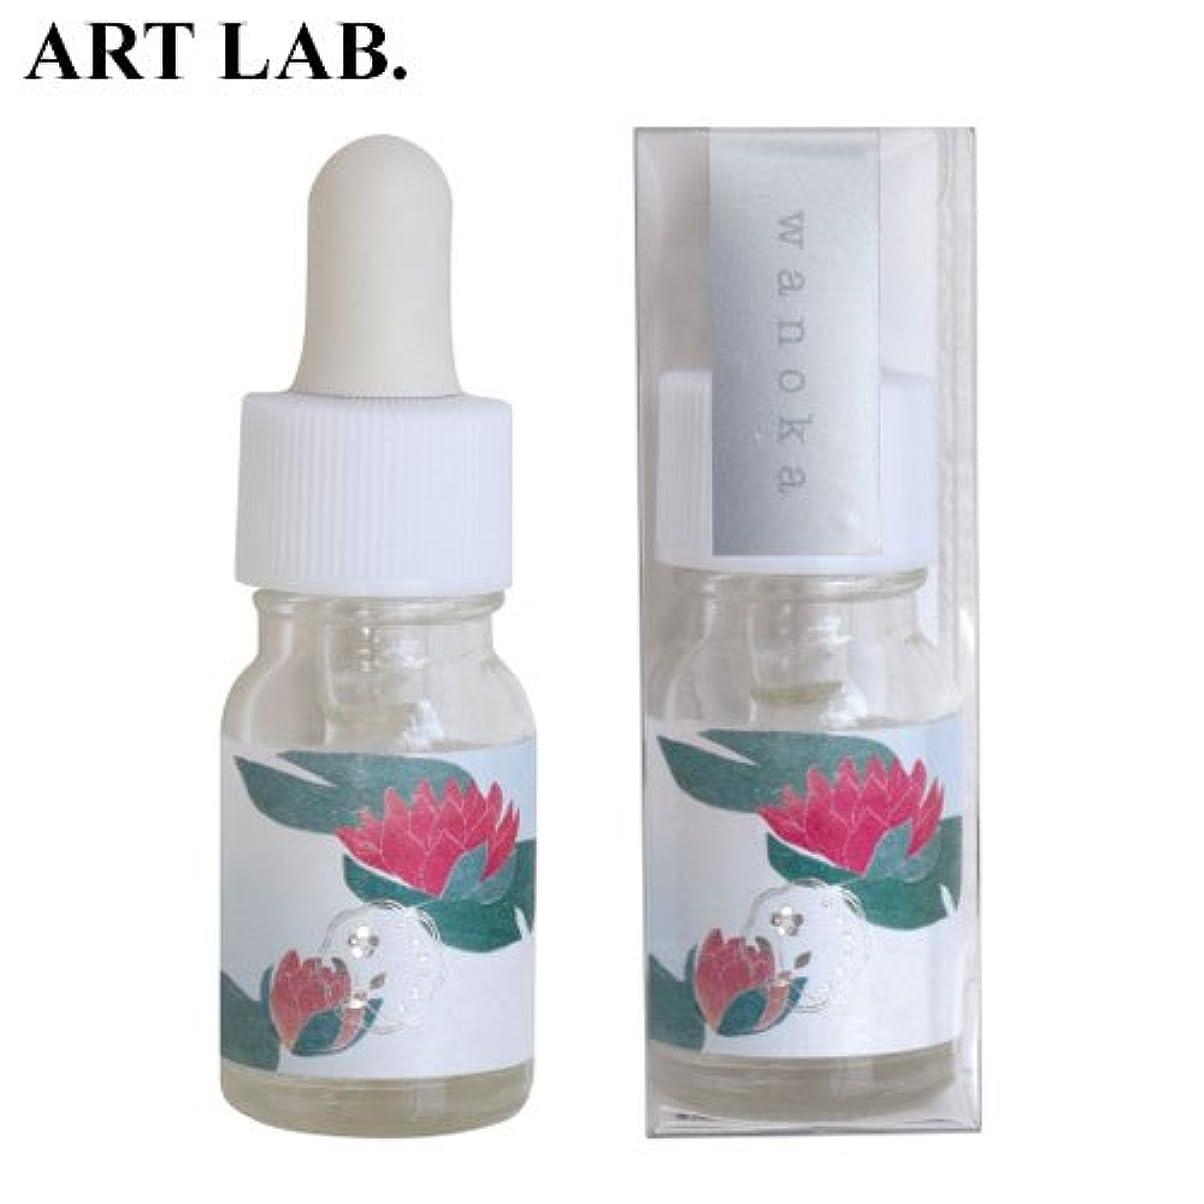 wanoka香油アロマオイル睡蓮《睡蓮をイメージした清楚な香り》ART LABAromatic oil